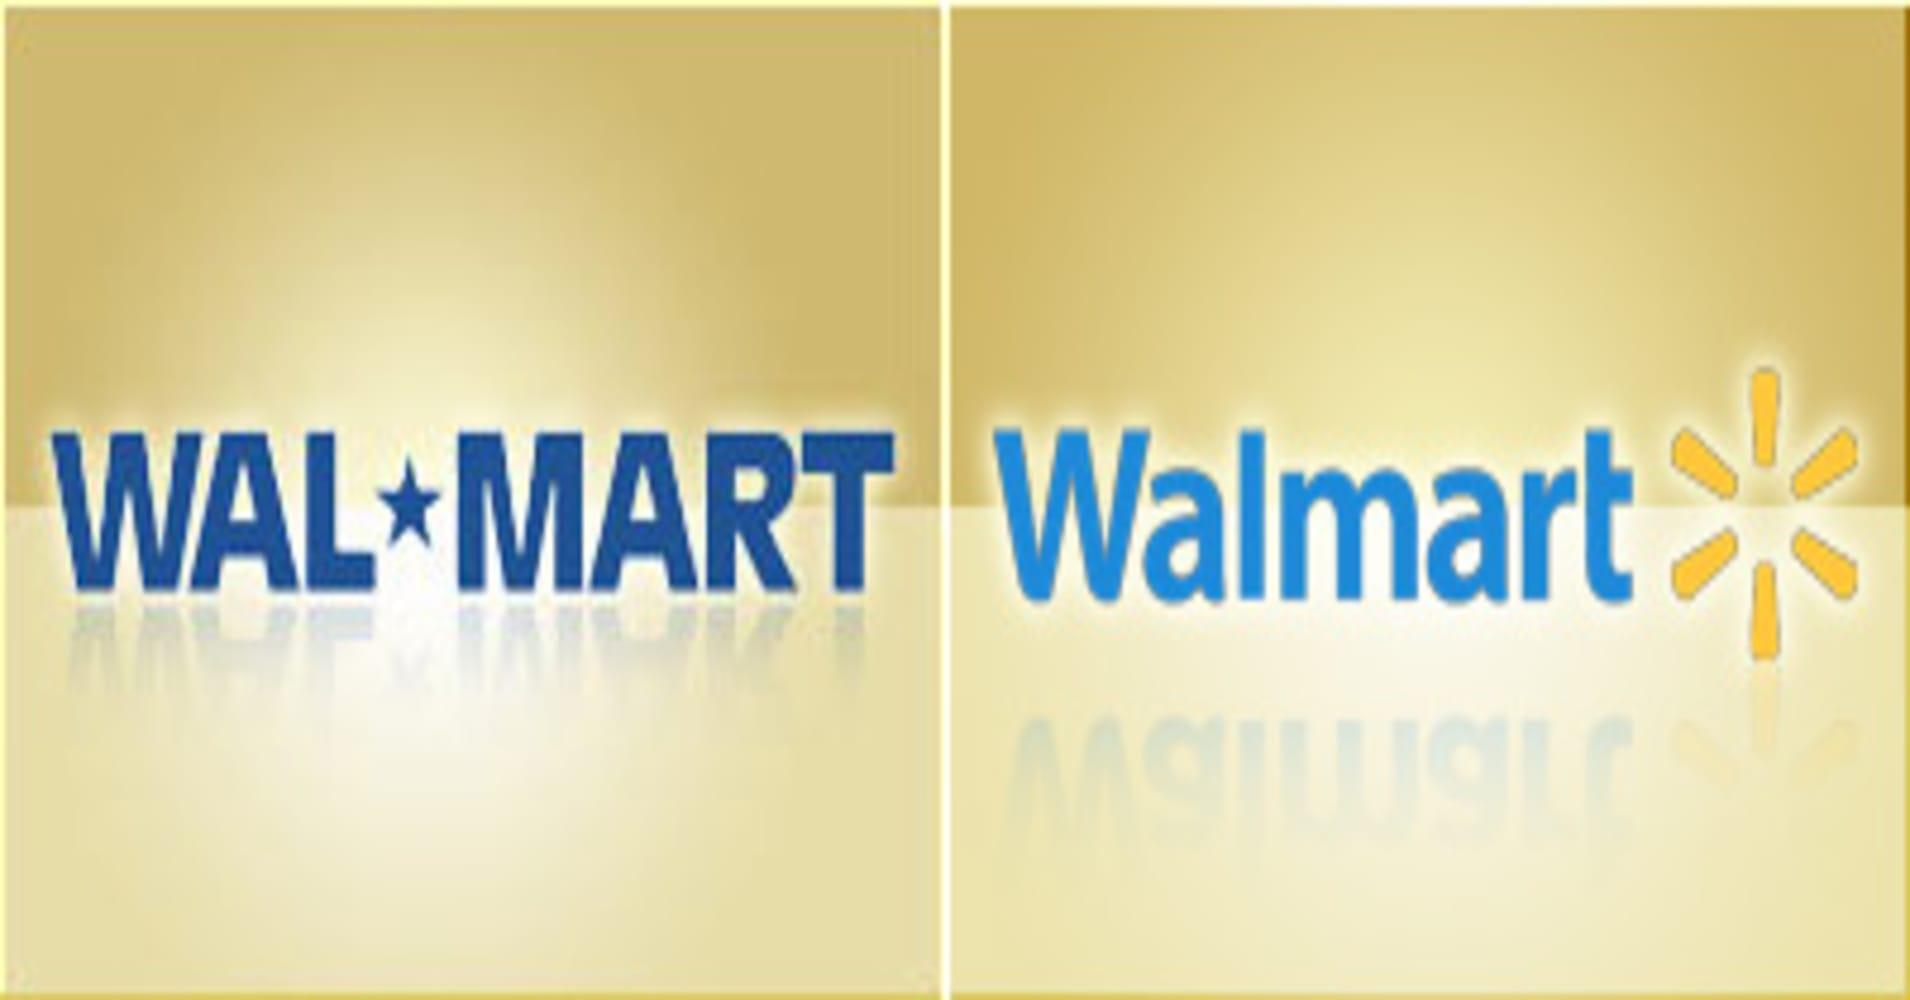 Wal-Mart? Wal*Mart?? Walmart???